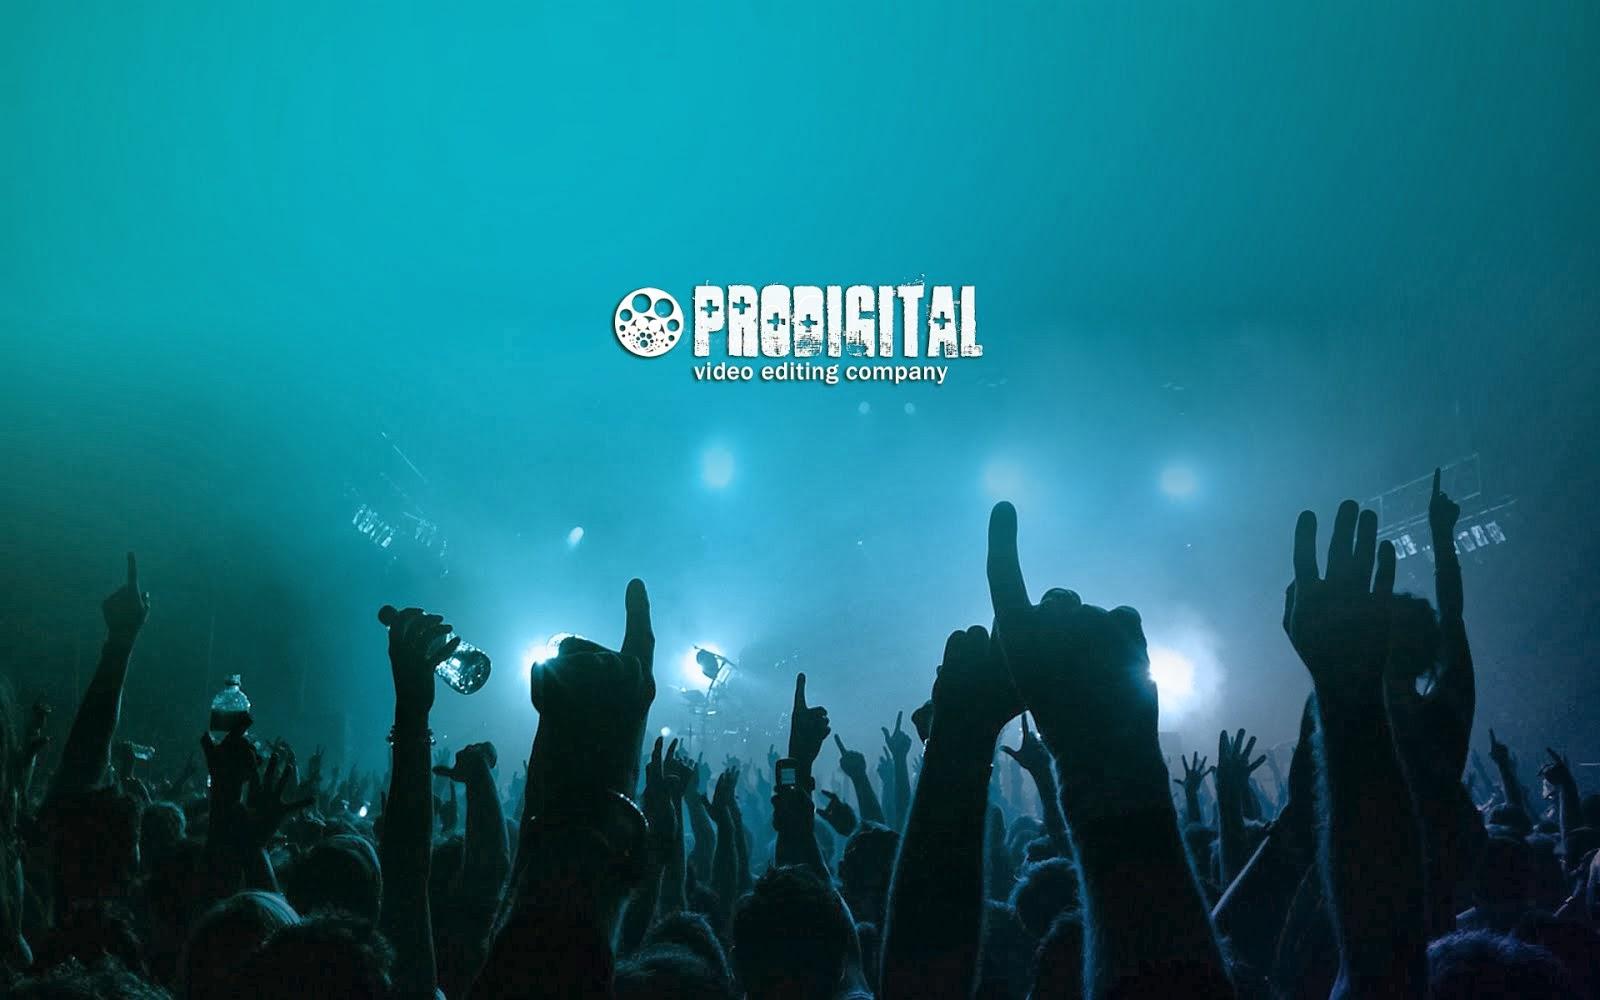 prodigital